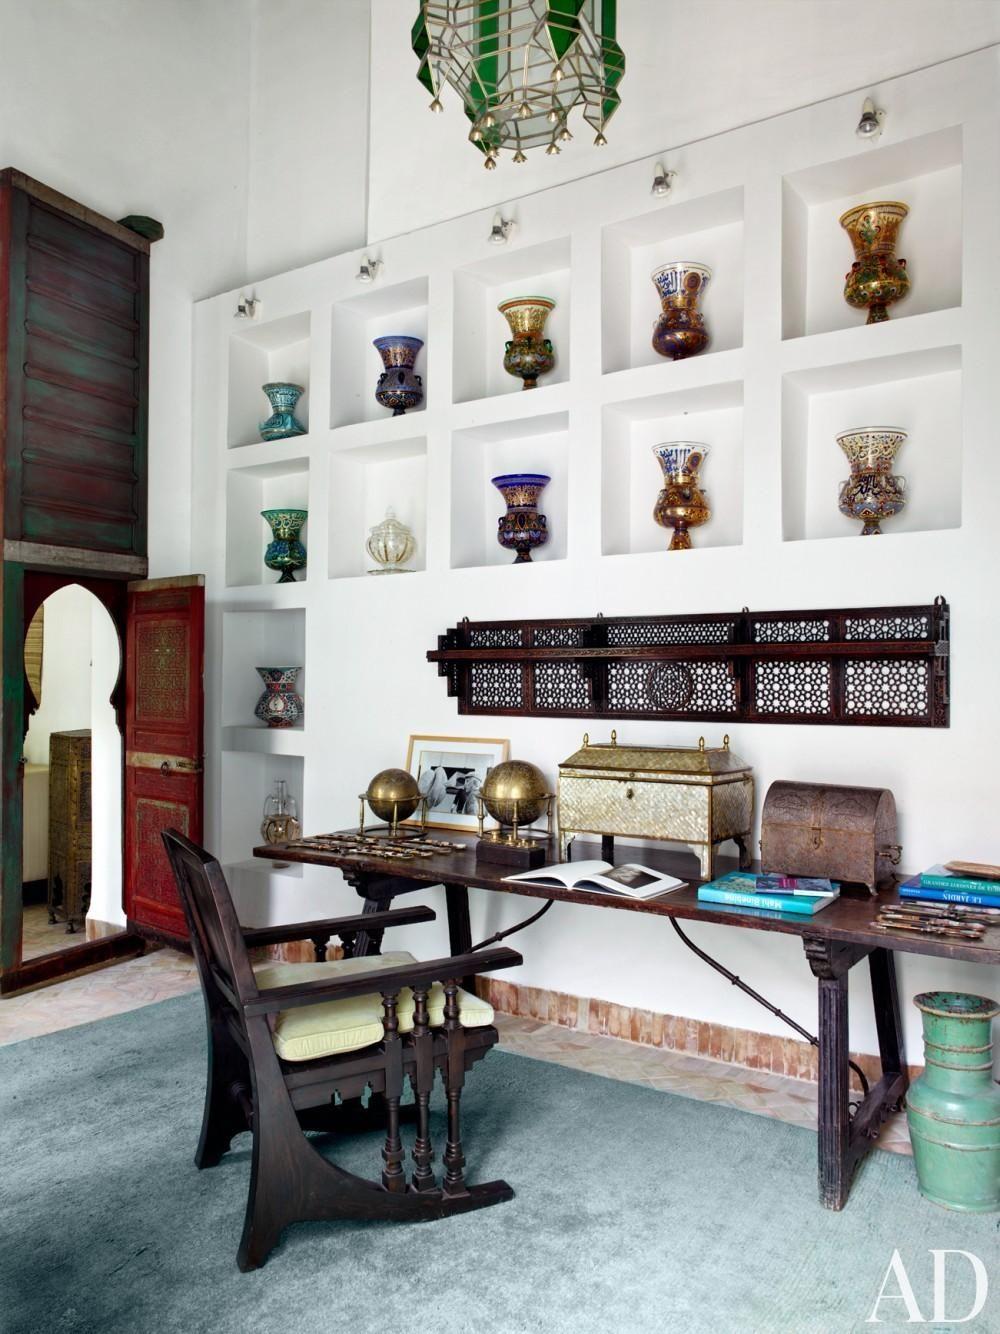 Exotic Bedroom by Ahmad Sardar-Afkhami in Marrakech, Morocco ...